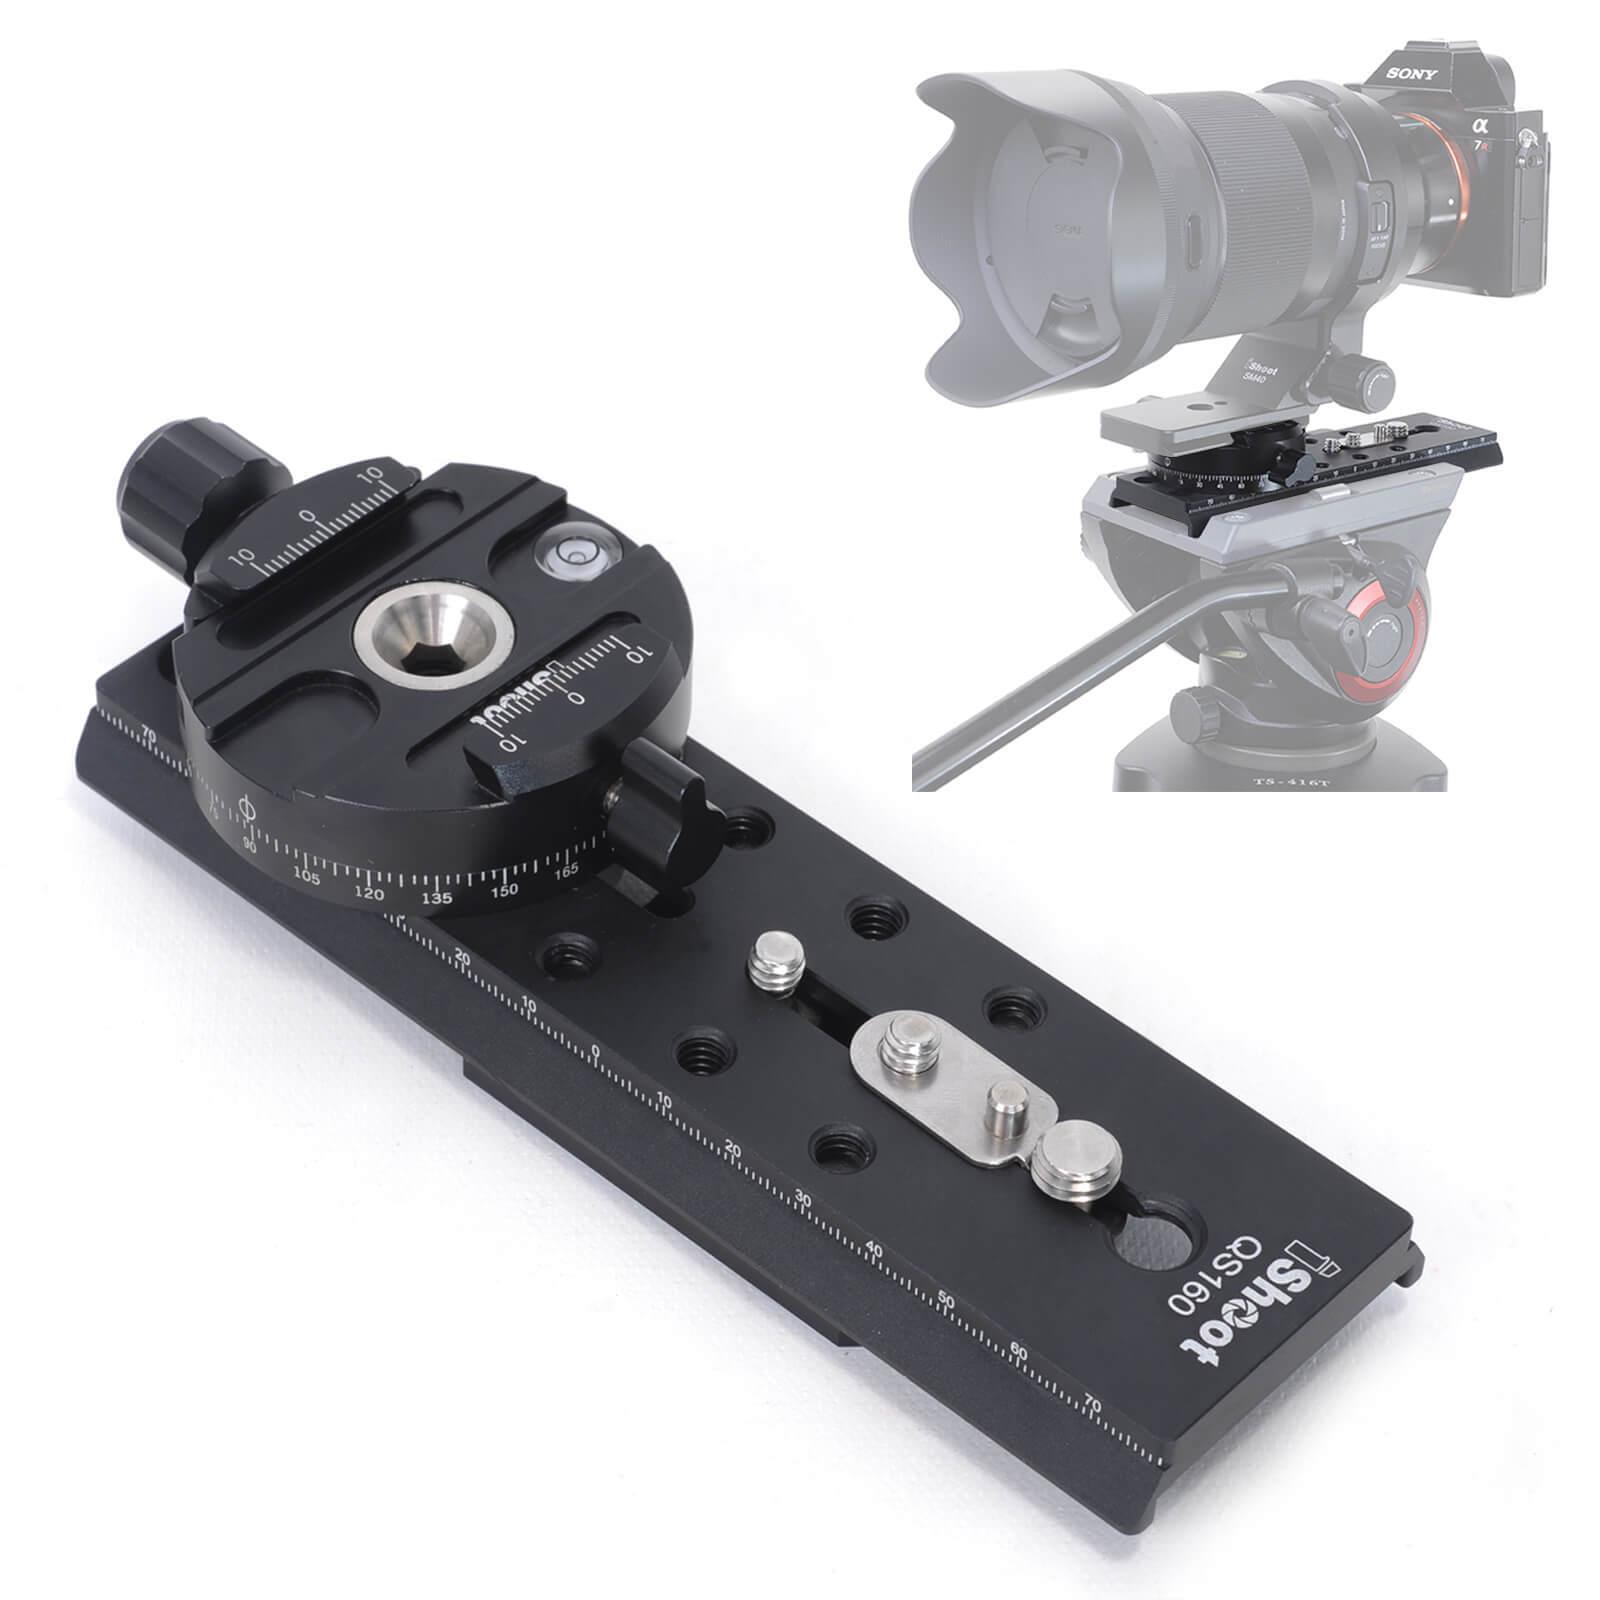 Converter for Arca-Swiss Quick Release Plate to Sachtler Tripod Fluid Video Head